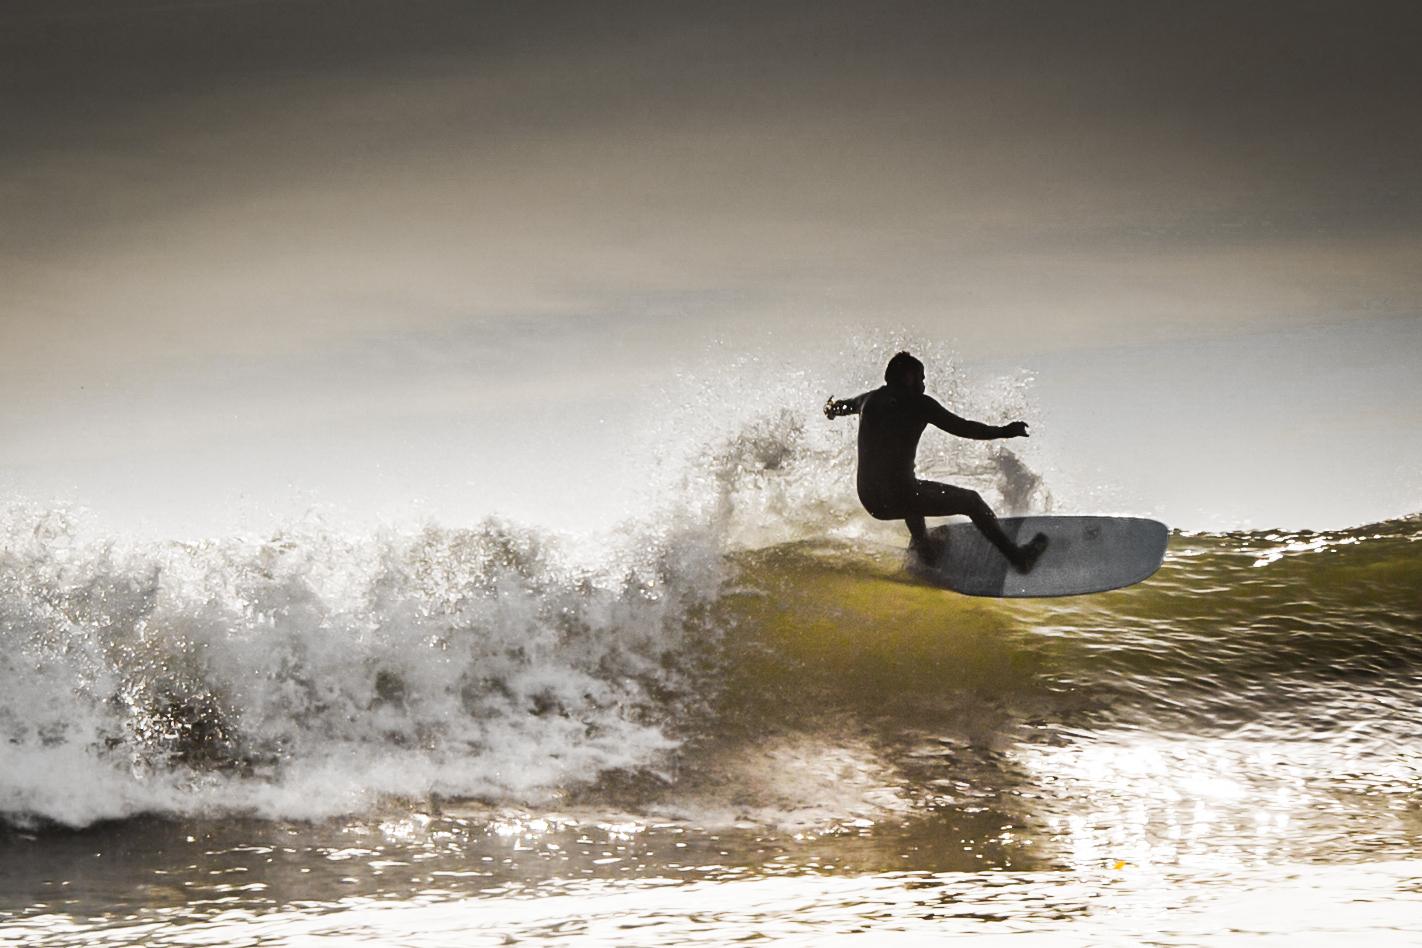 Monkeywing-Surfboard-Capitola.jpg